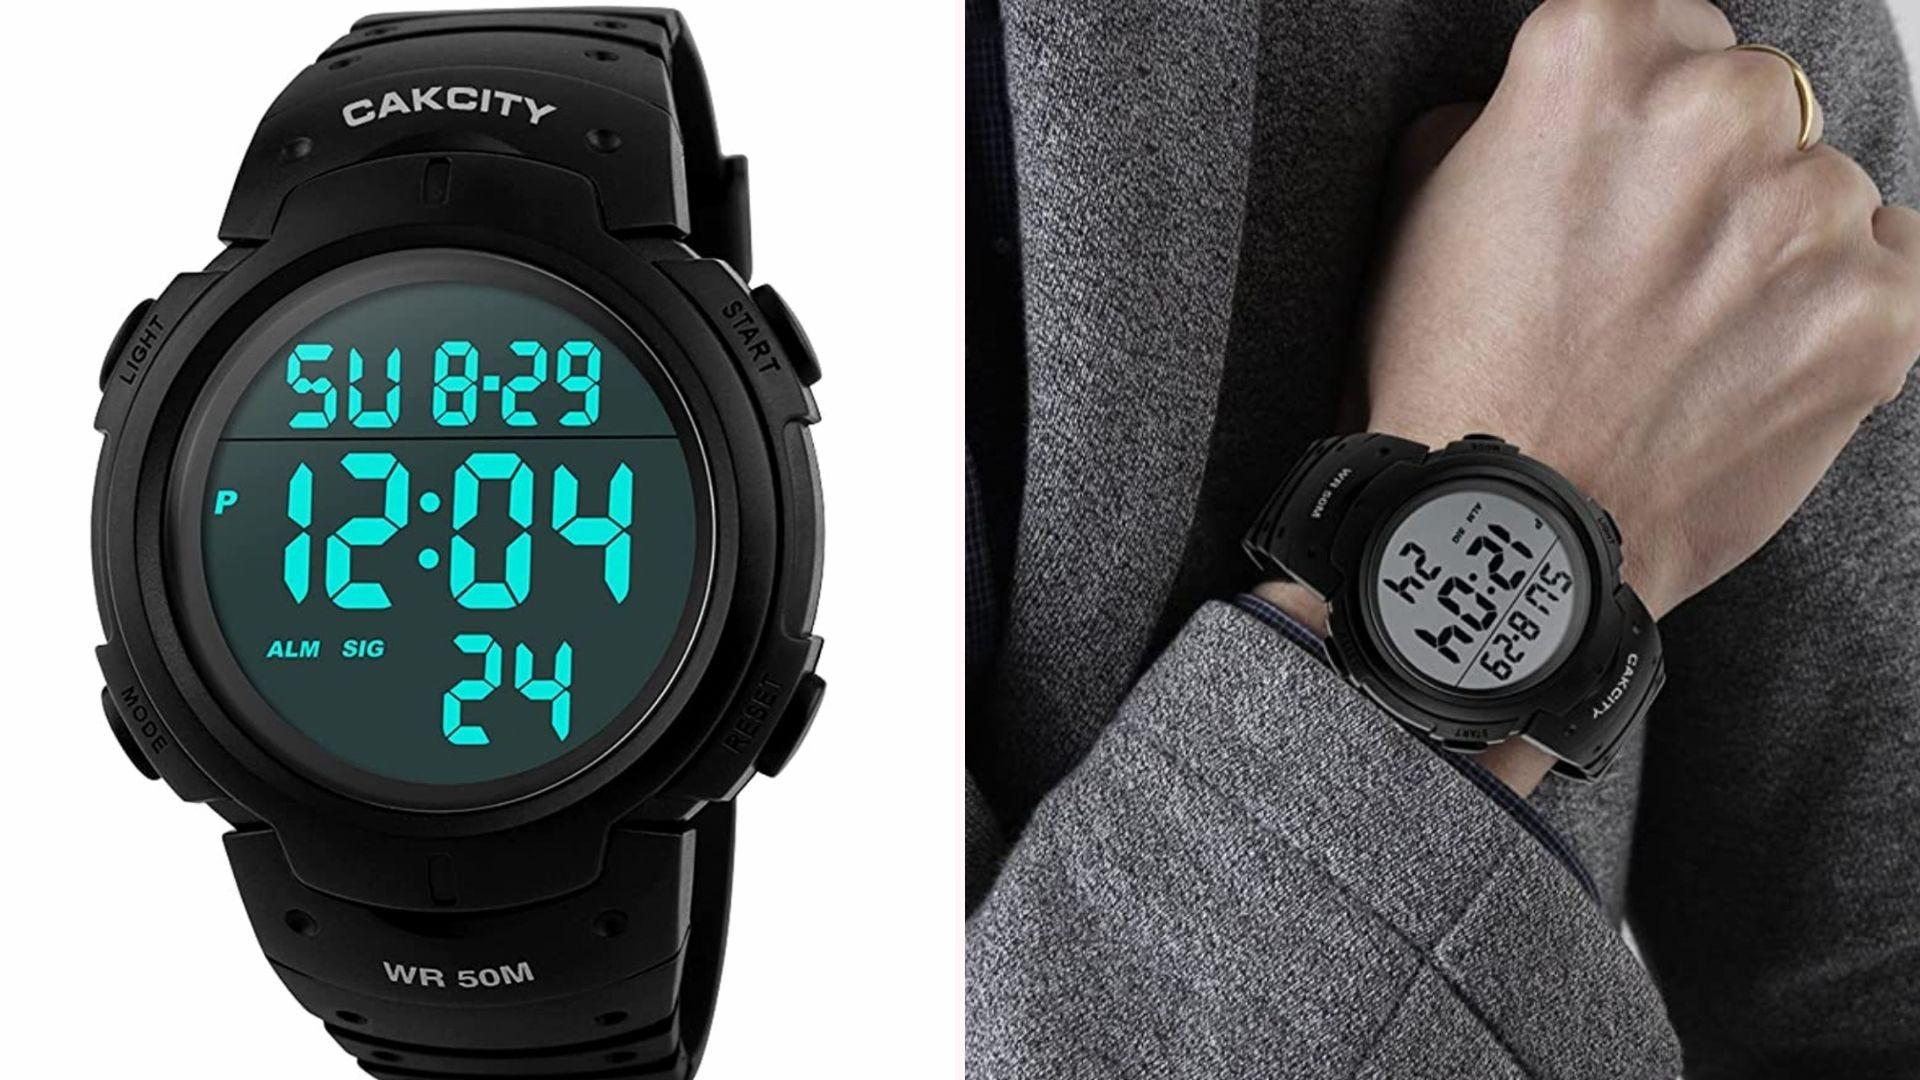 a black digital sports watch with aqua numbers shown on a man's wrist